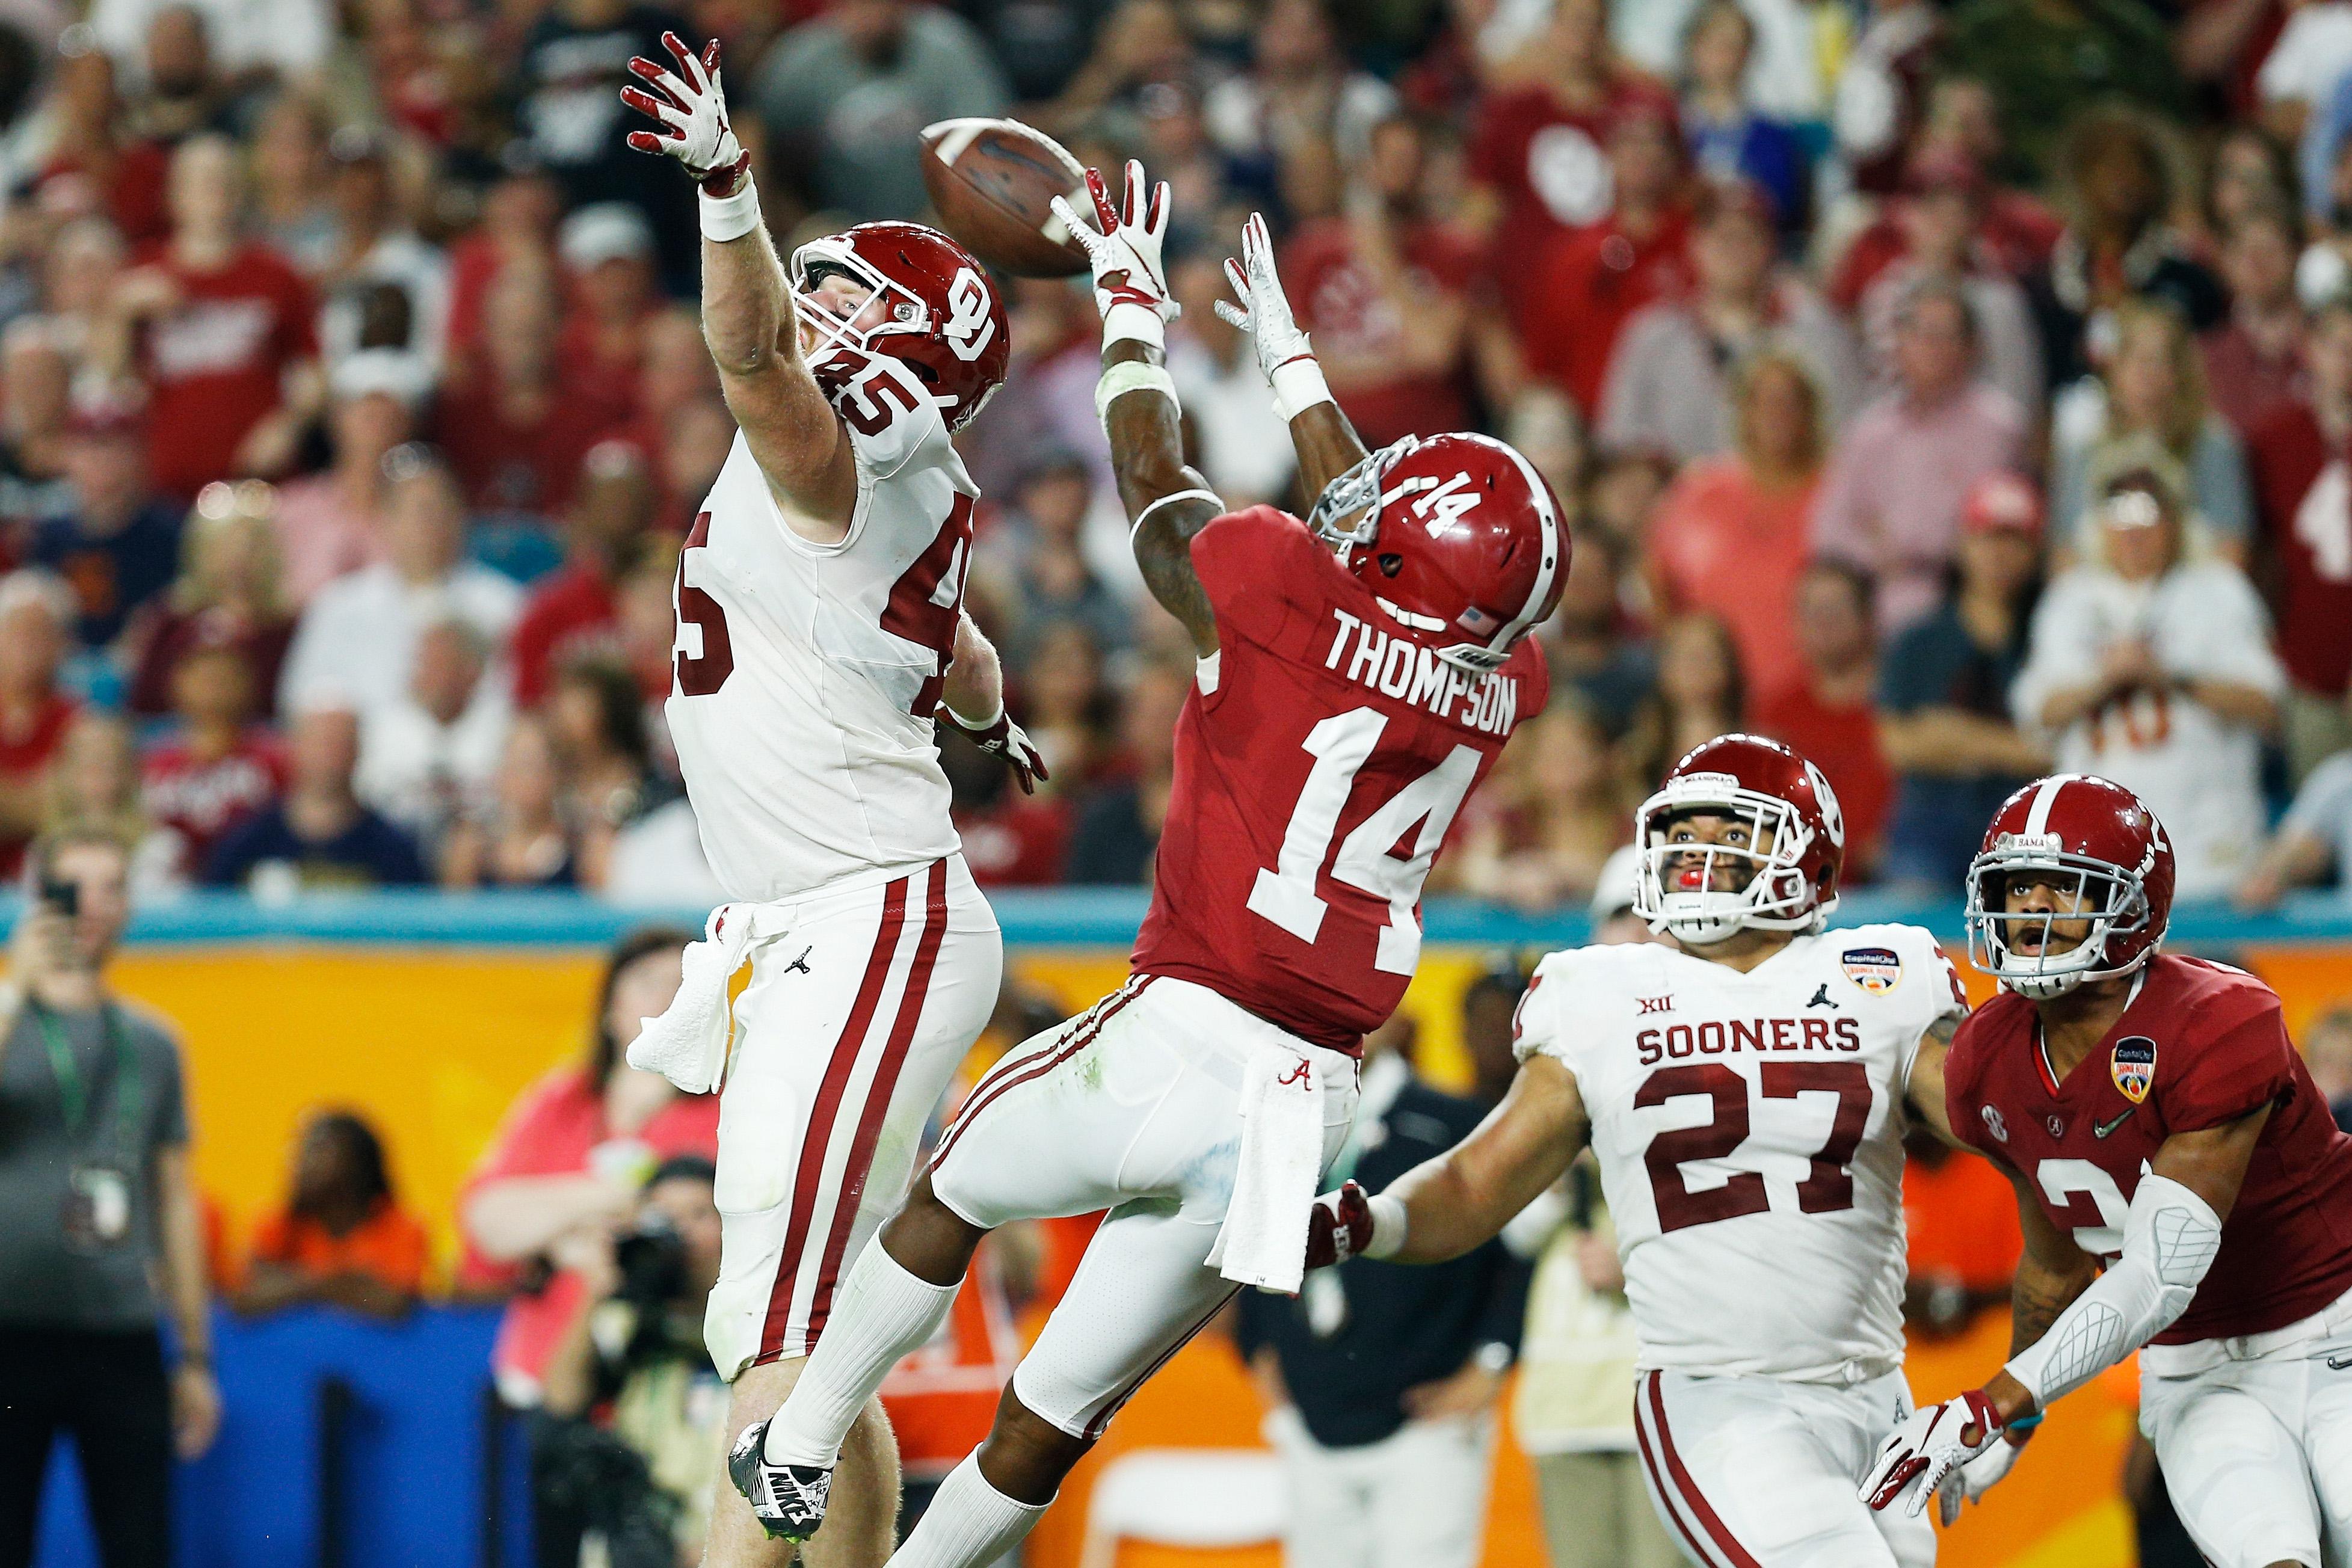 College Football Playoff Semifinal at the Capital One Orange Bowl - Alabama v Oklahoma